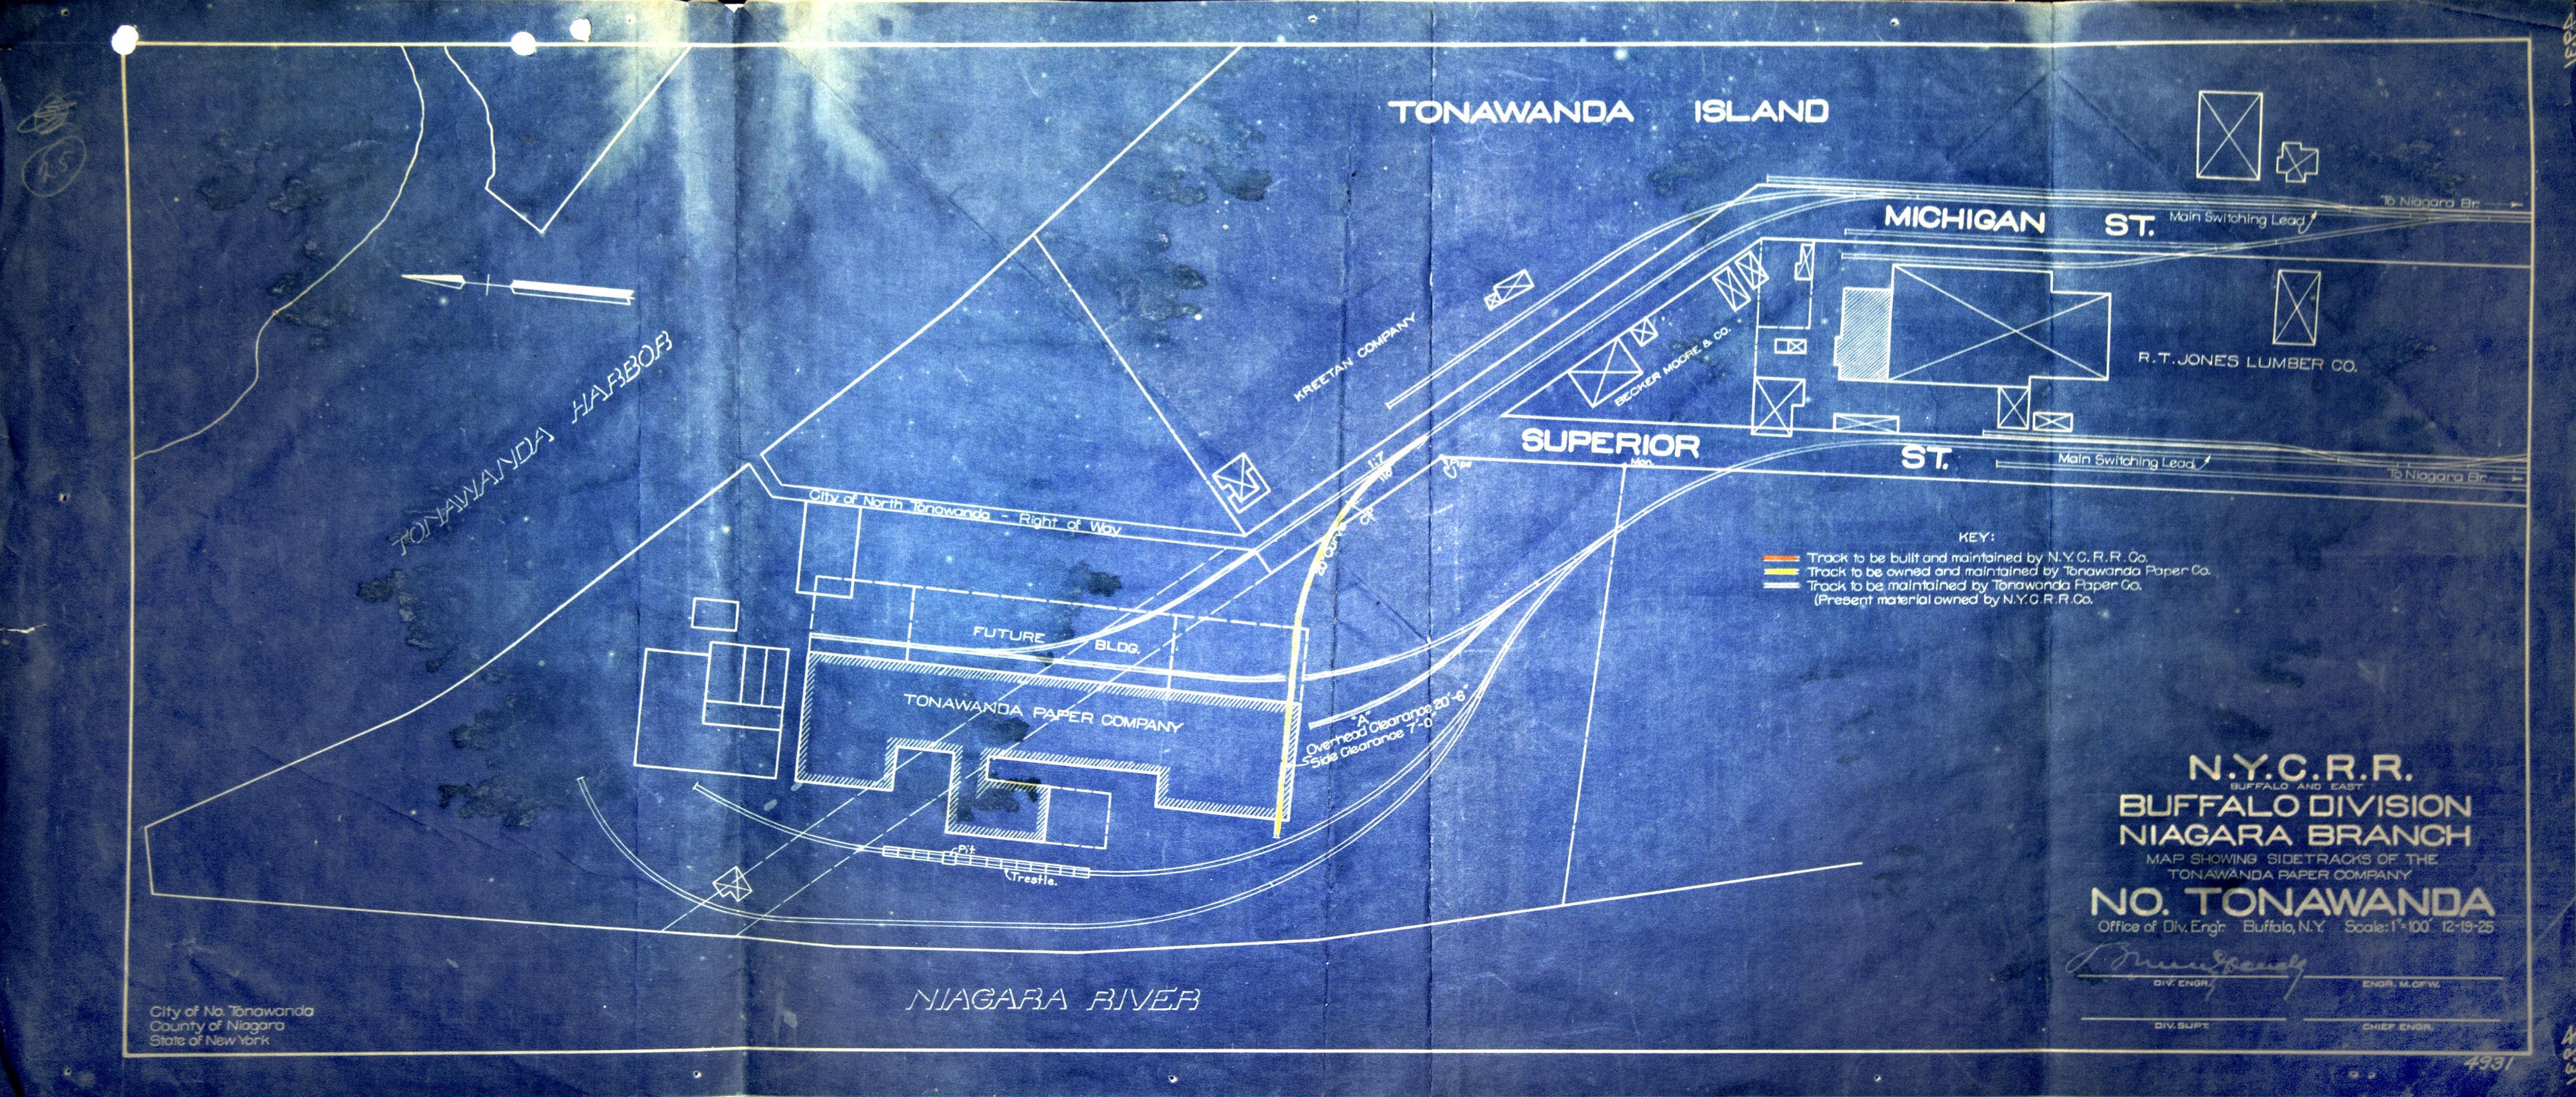 NYCRR on Tonawanda Island, hi-res blueprint (1922-12-19).jpg